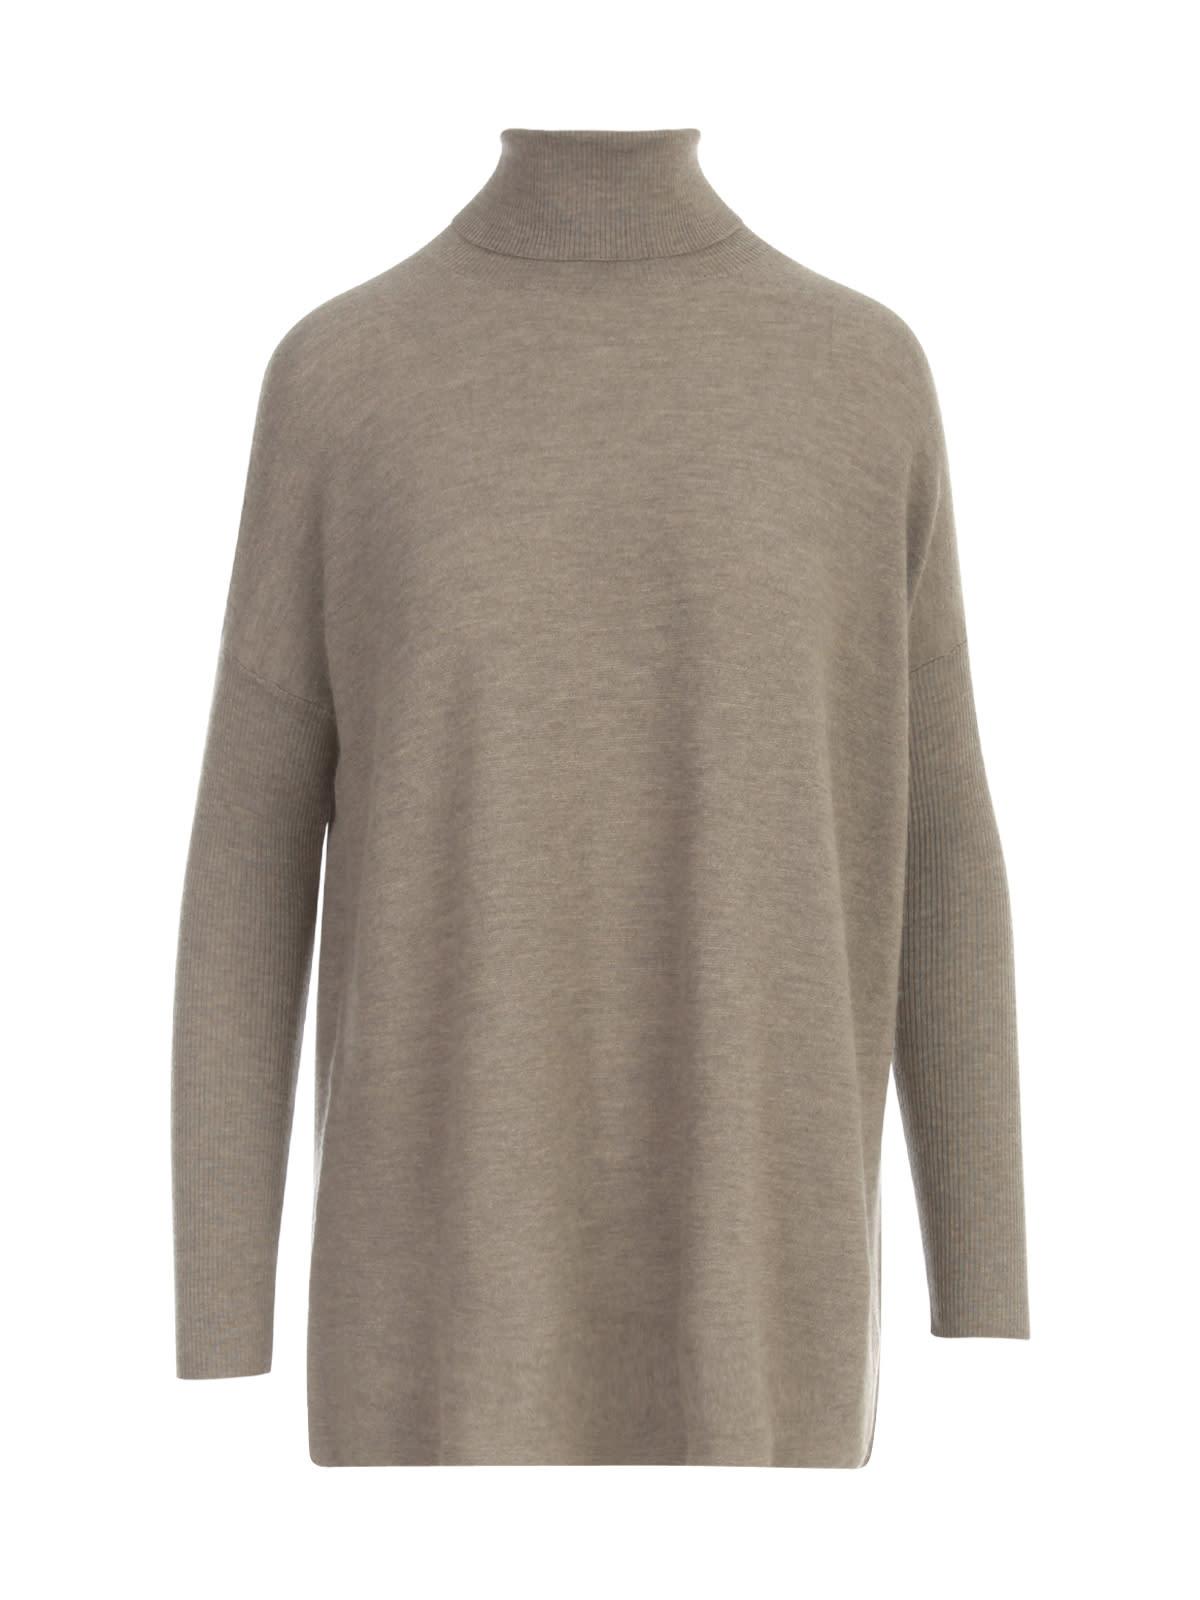 Straight Turtle Neck L/s Sweater